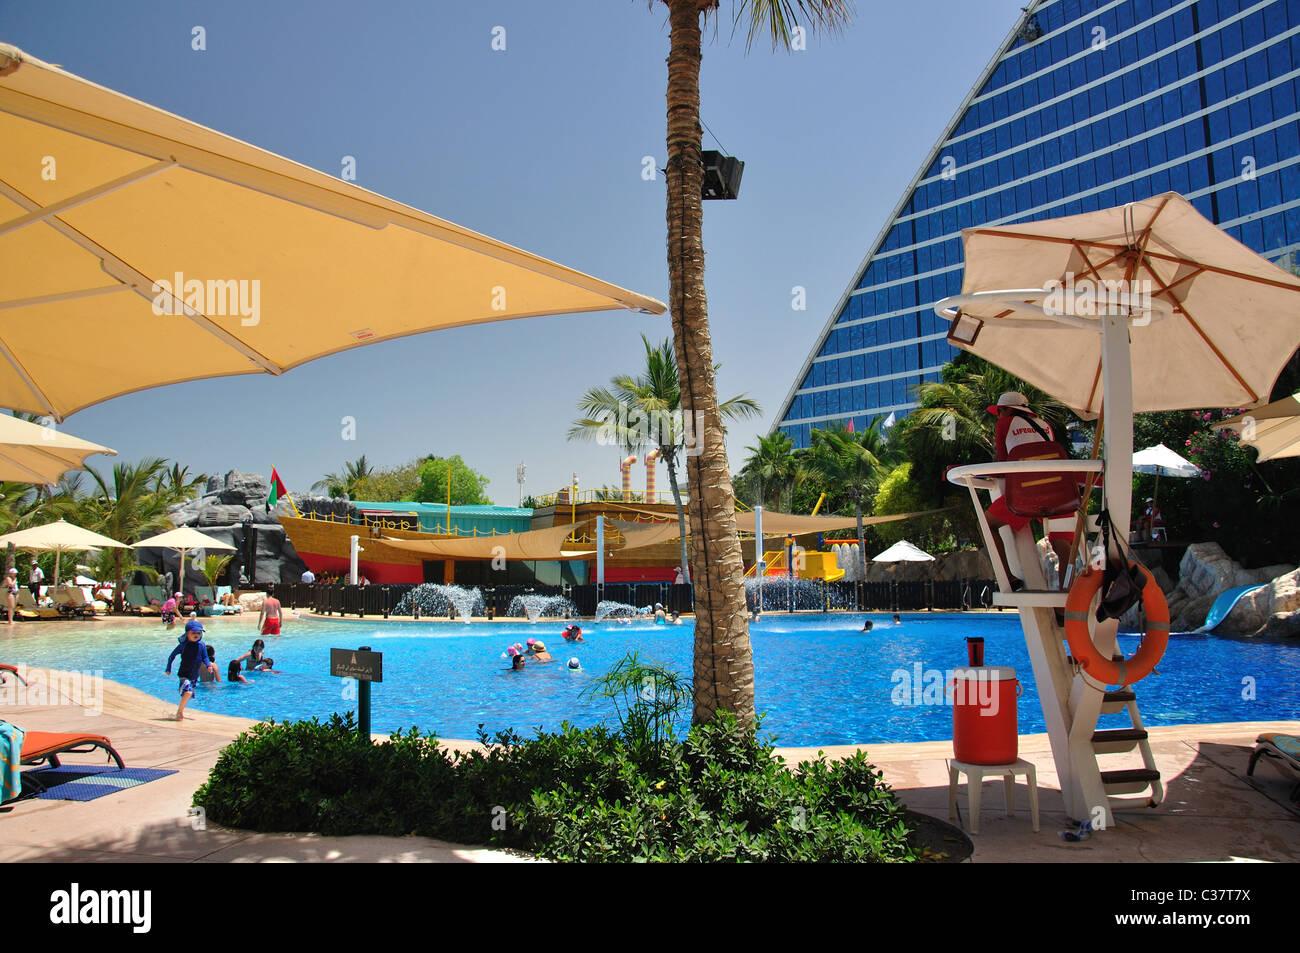 Family Swimming Pool Jumeirah Beach Hotel Jumeirah Dubai United Stock Photo 36437406 Alamy